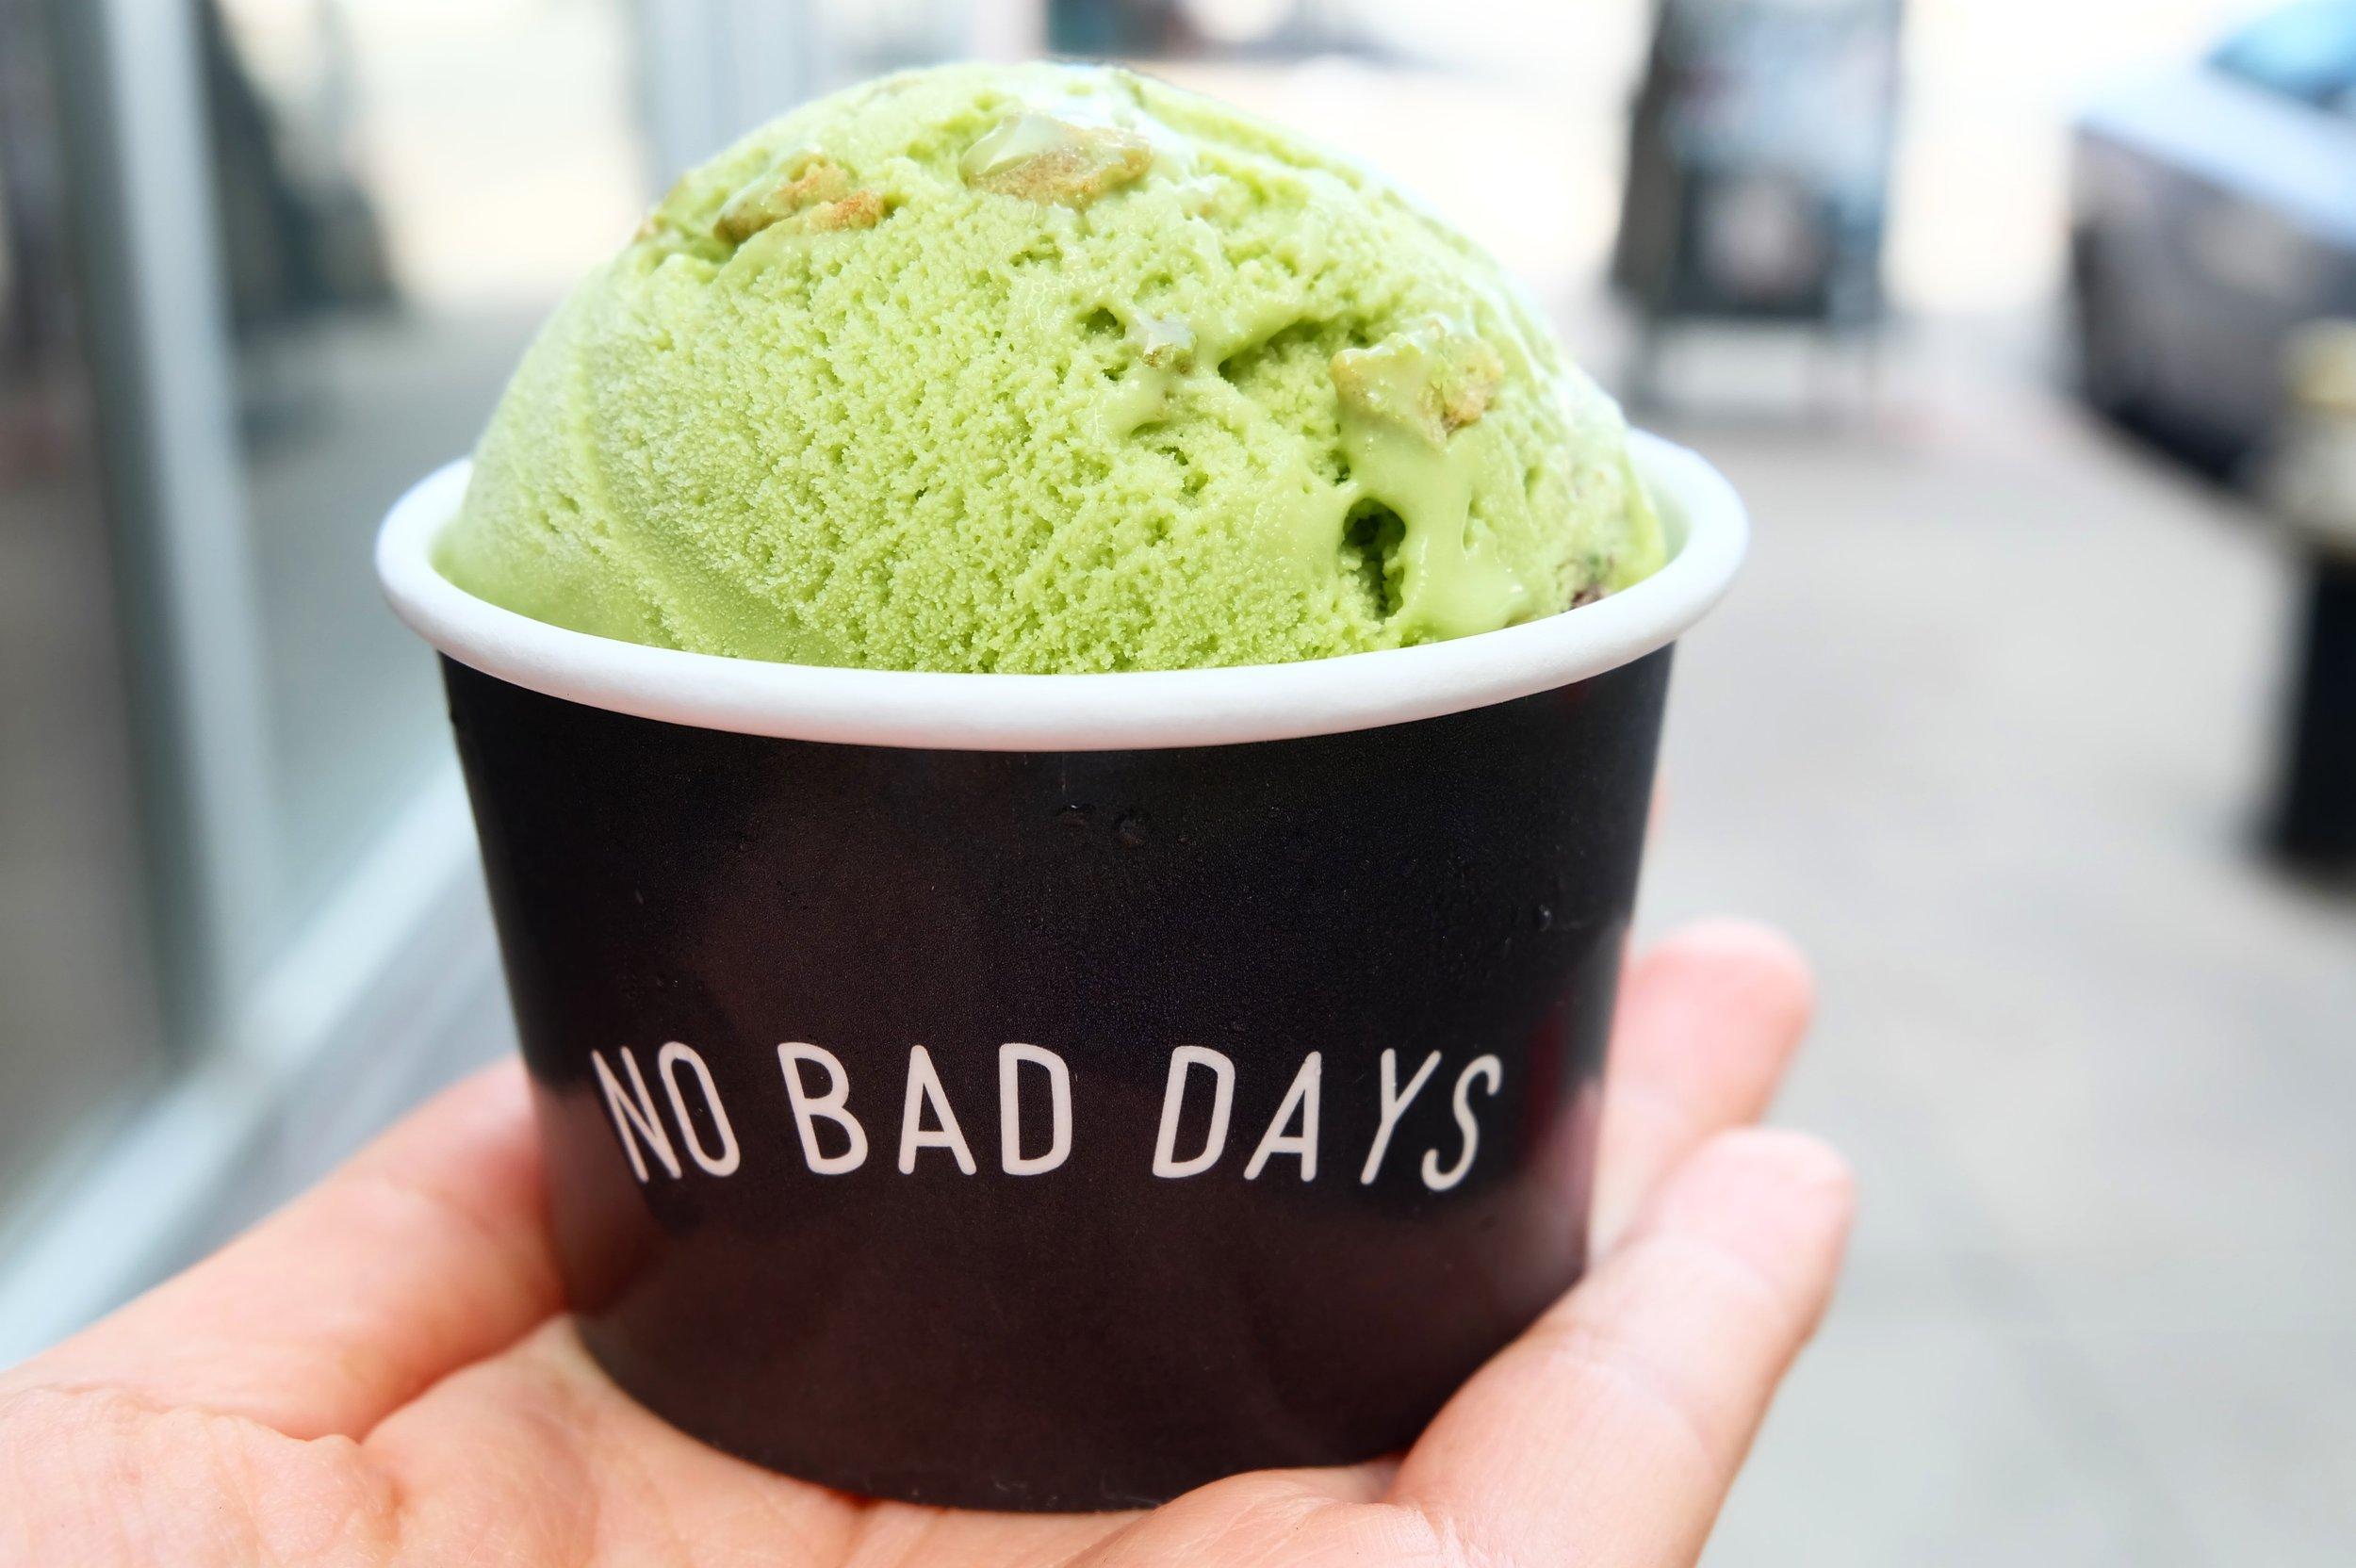 Wholesale — OddFellows Ice Cream Co